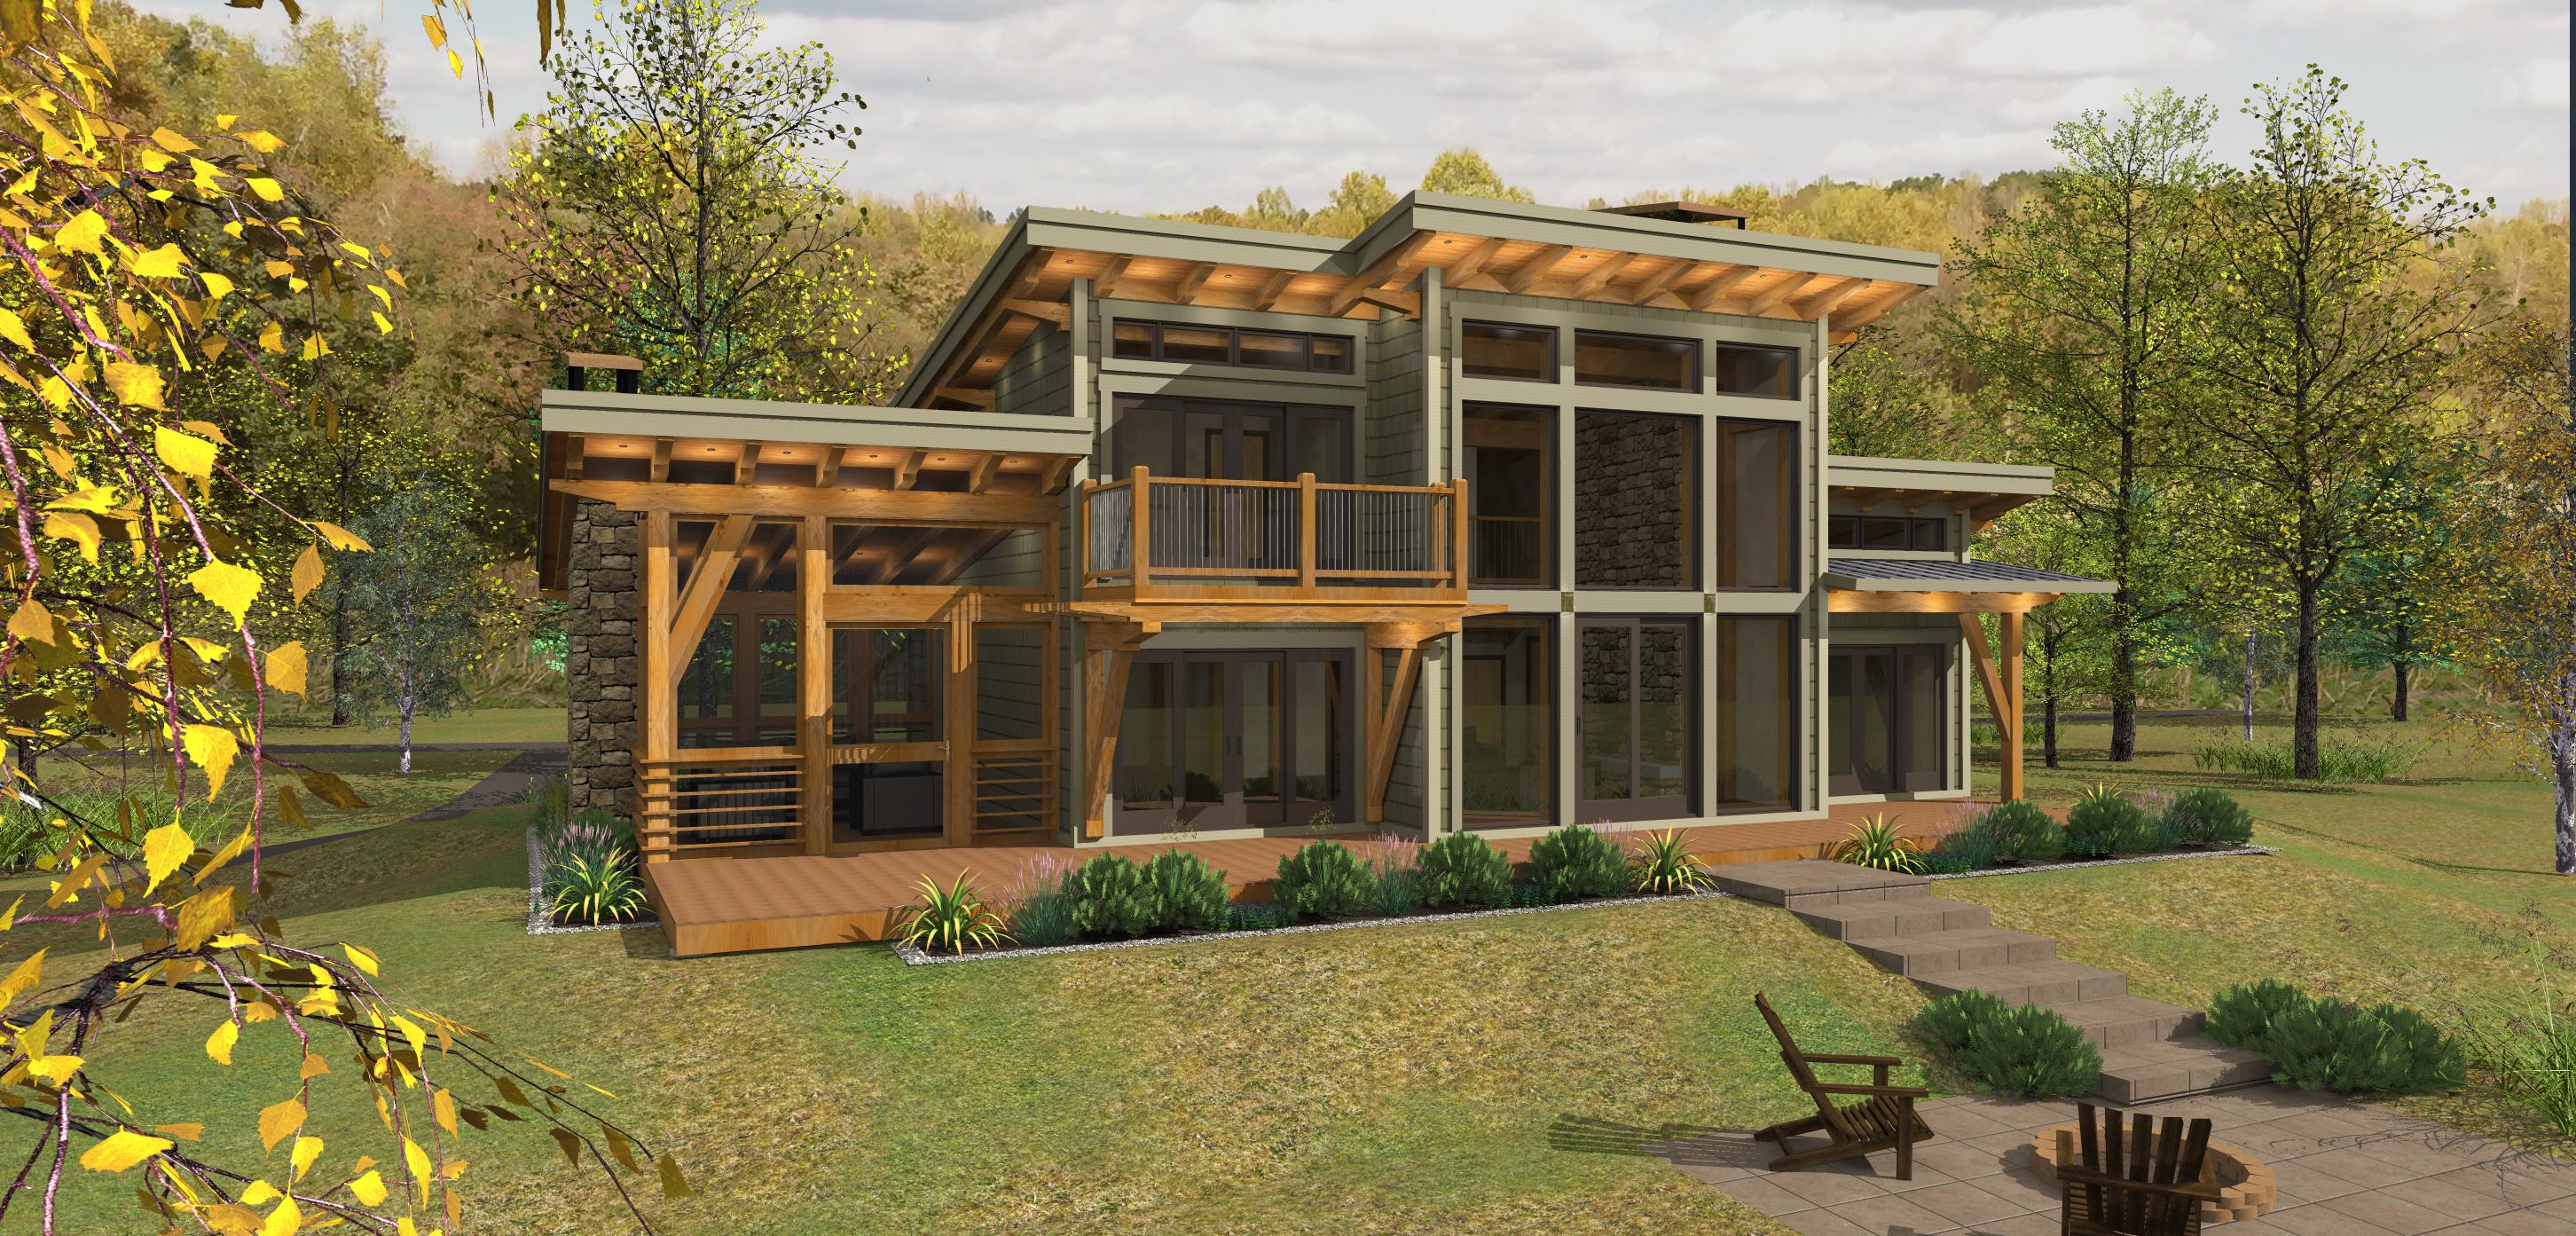 Timber Frame House Plans Canada House Design Plans